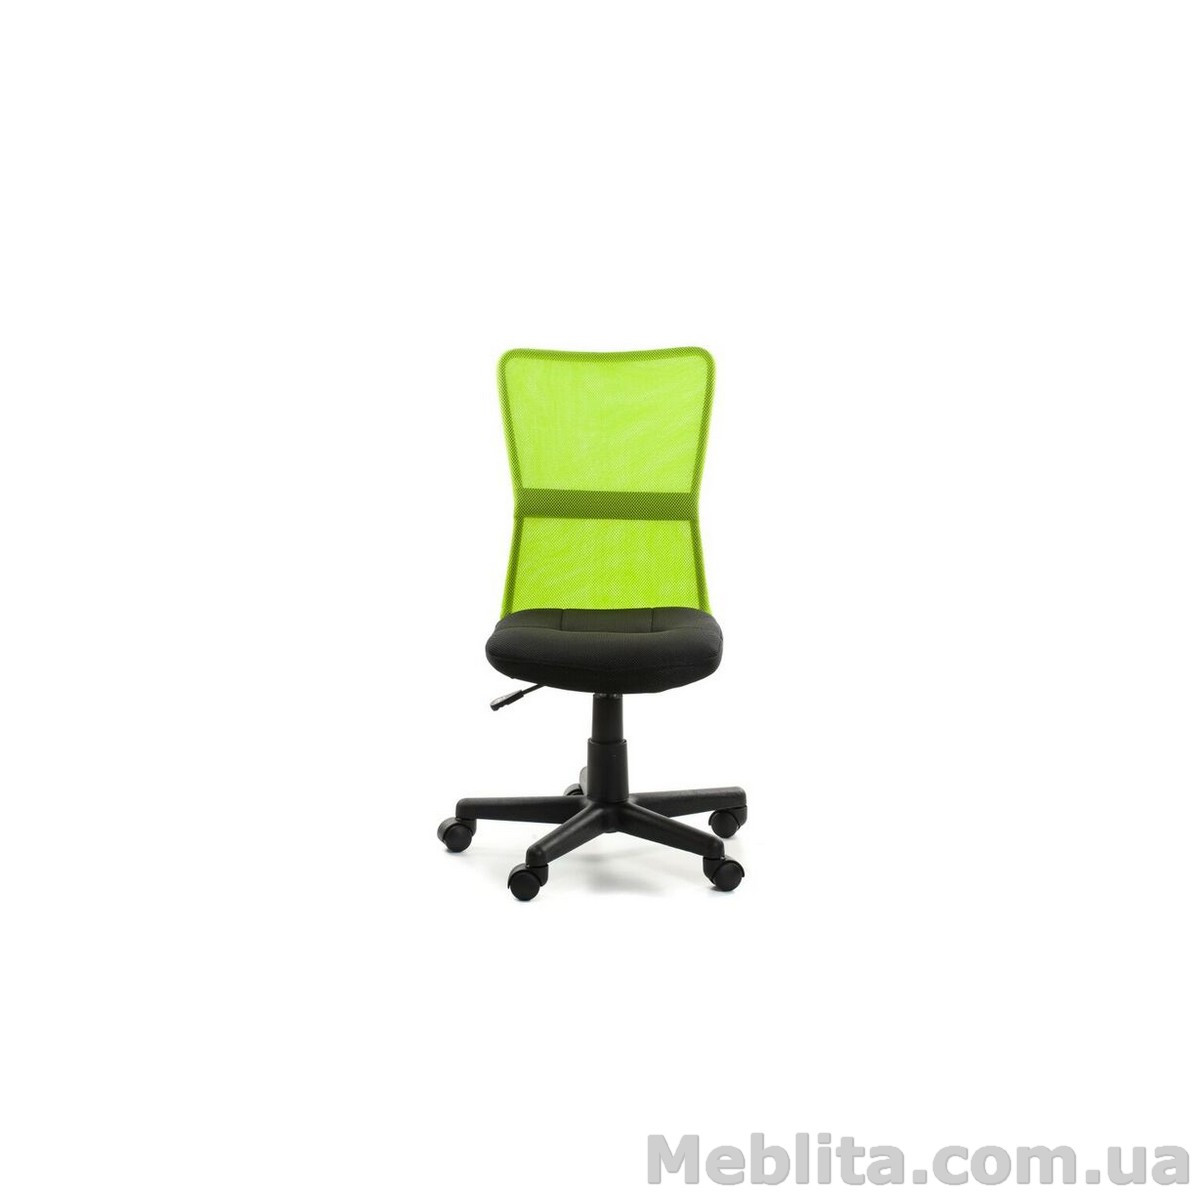 Кресло офисное BELICE, Black/Green Office4You